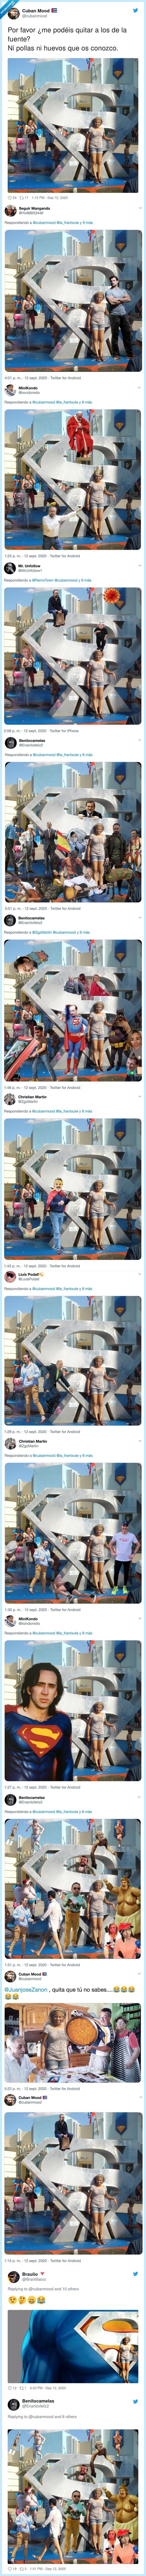 chop,escultura,fuente,superman